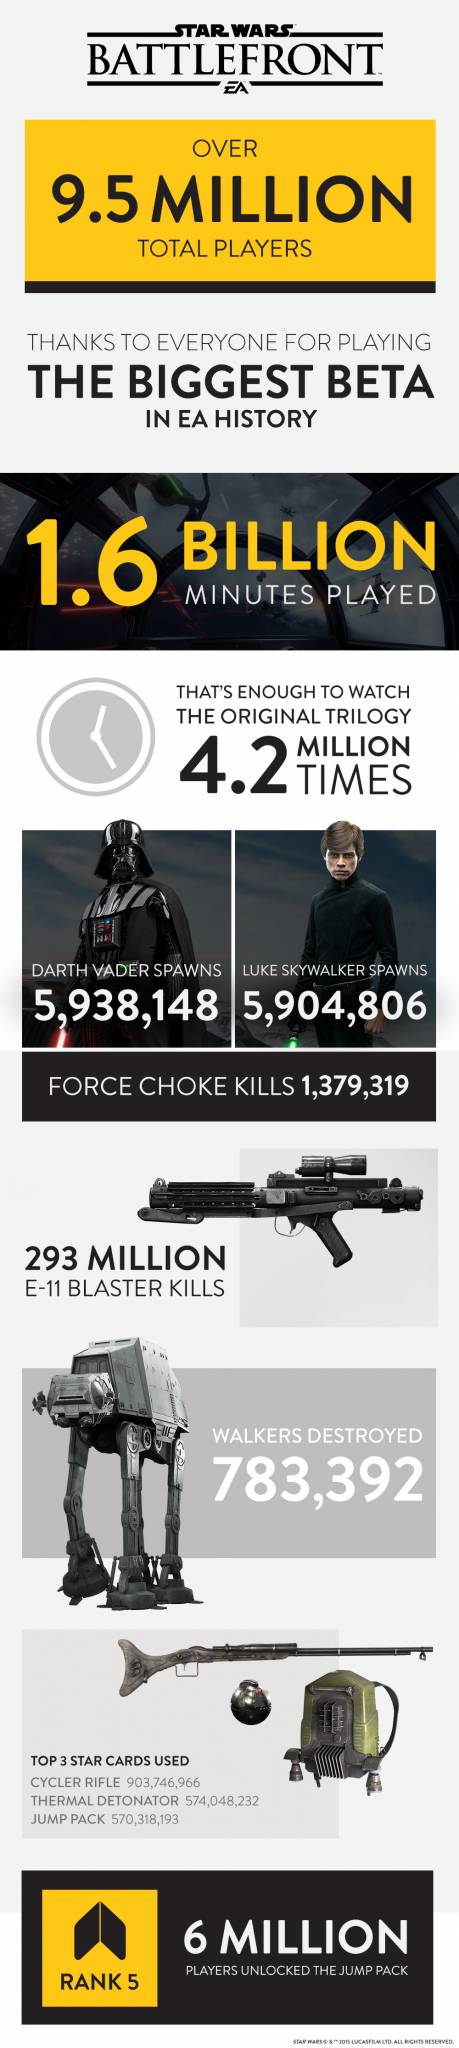 SWB beta infographic